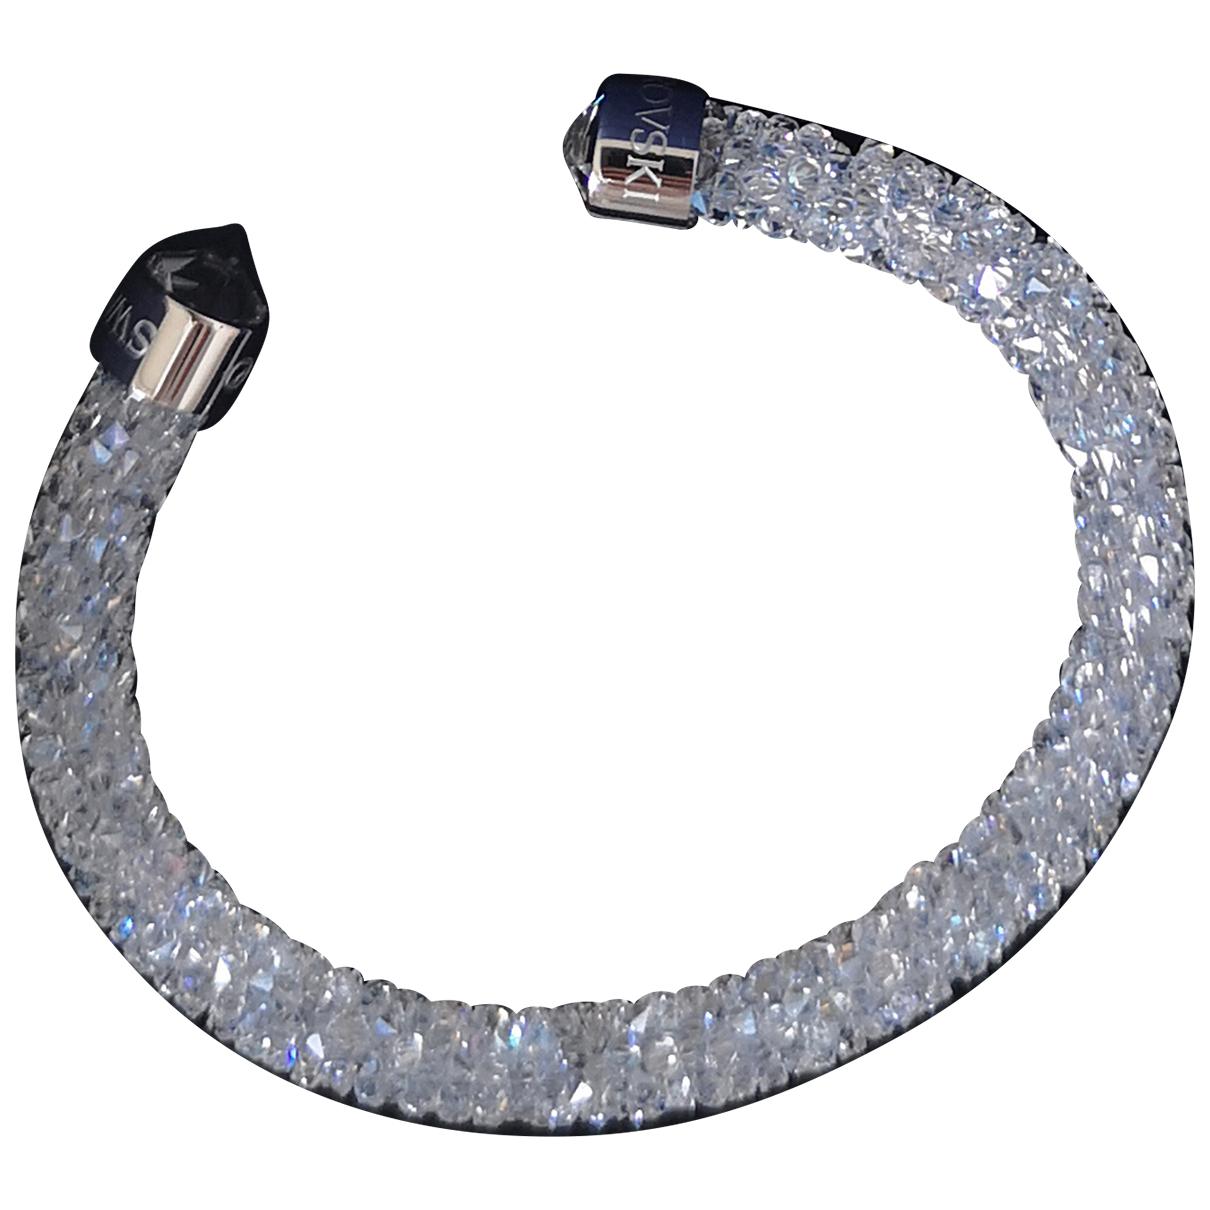 Swarovski - Bracelet Stardust pour femme en cristal - argente